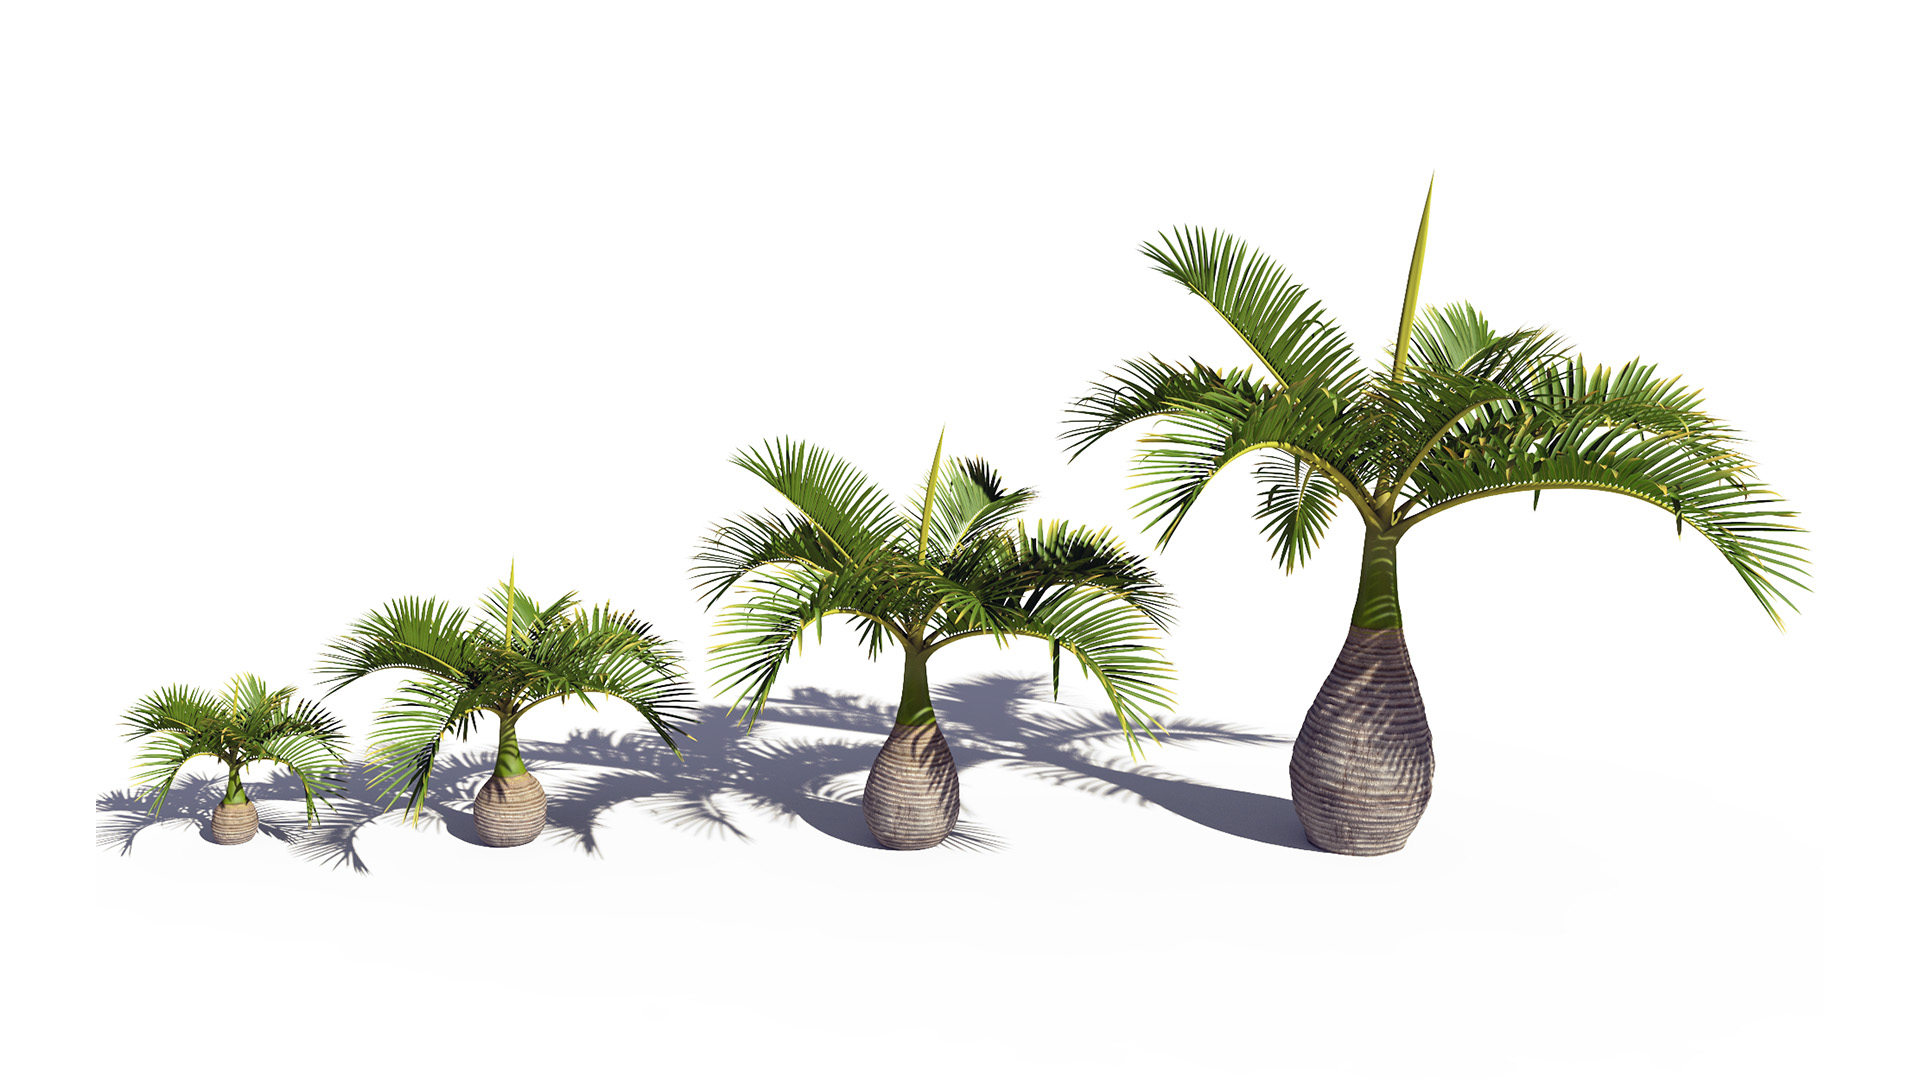 3D model of the Bottle palm Hyophorbe lagenicaulis maturity variations